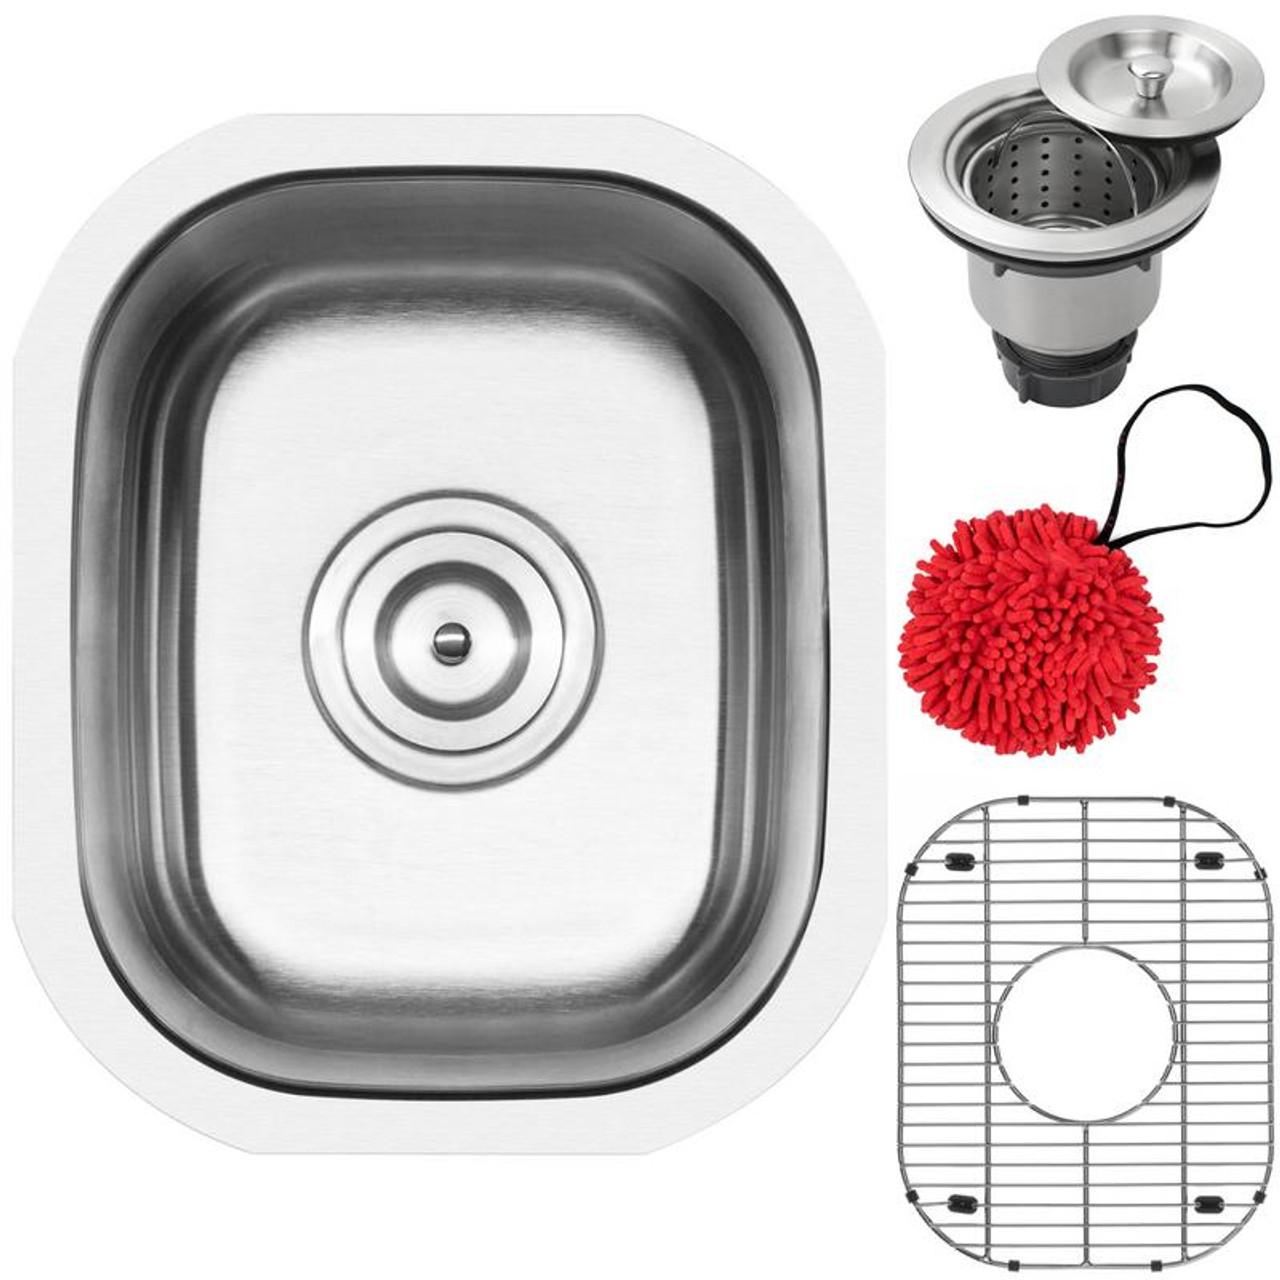 12 75 Ticor L8 Foster Series 18 Gauge Stainless Steel Undermount Single Basin Kitchen And Bar Sink Ticor